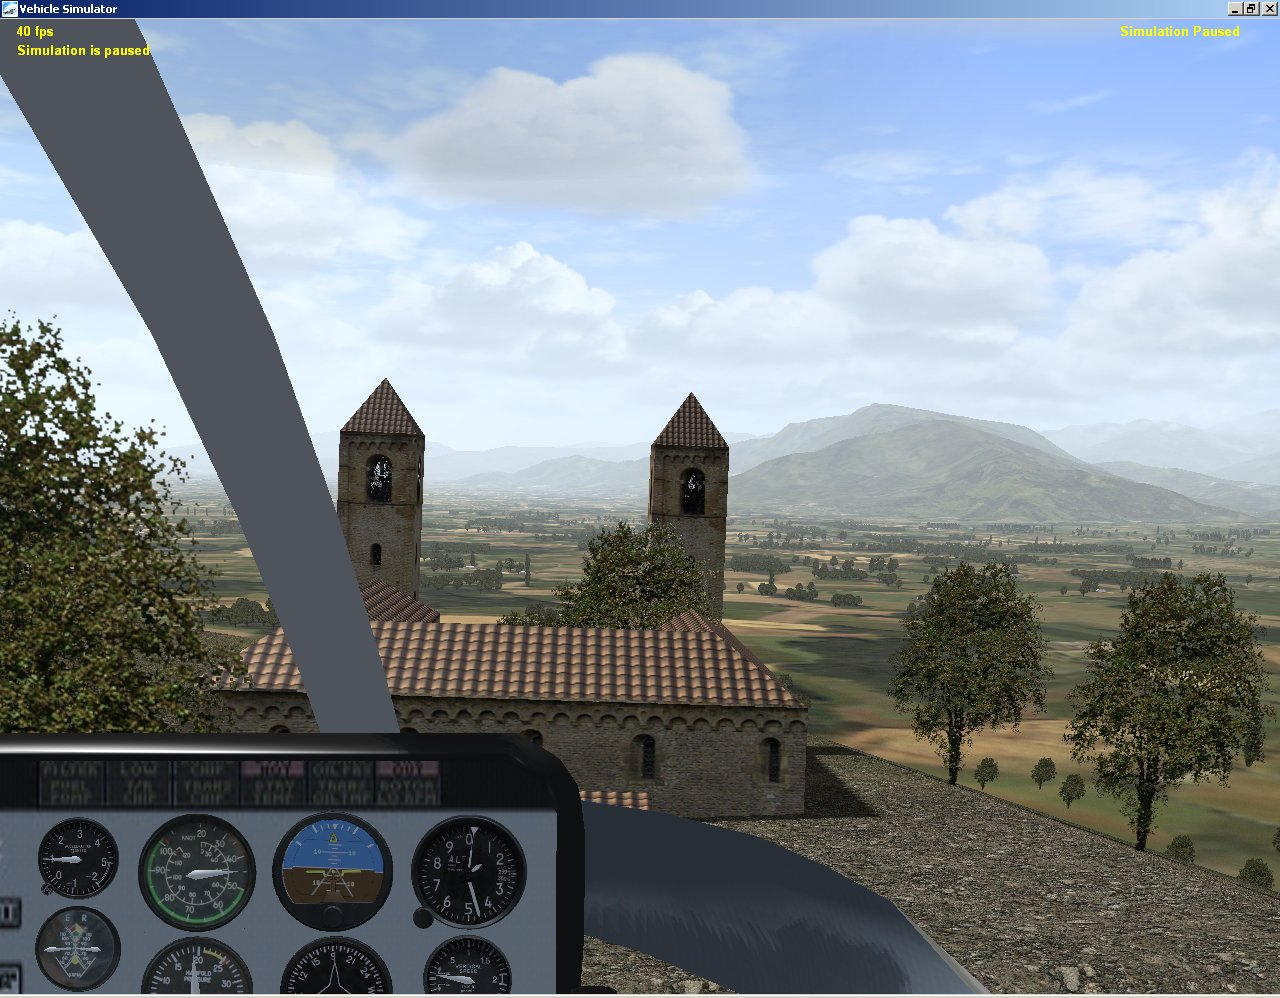 Roblox Uncopylocked Games Vermillion - Vehicle Simulator